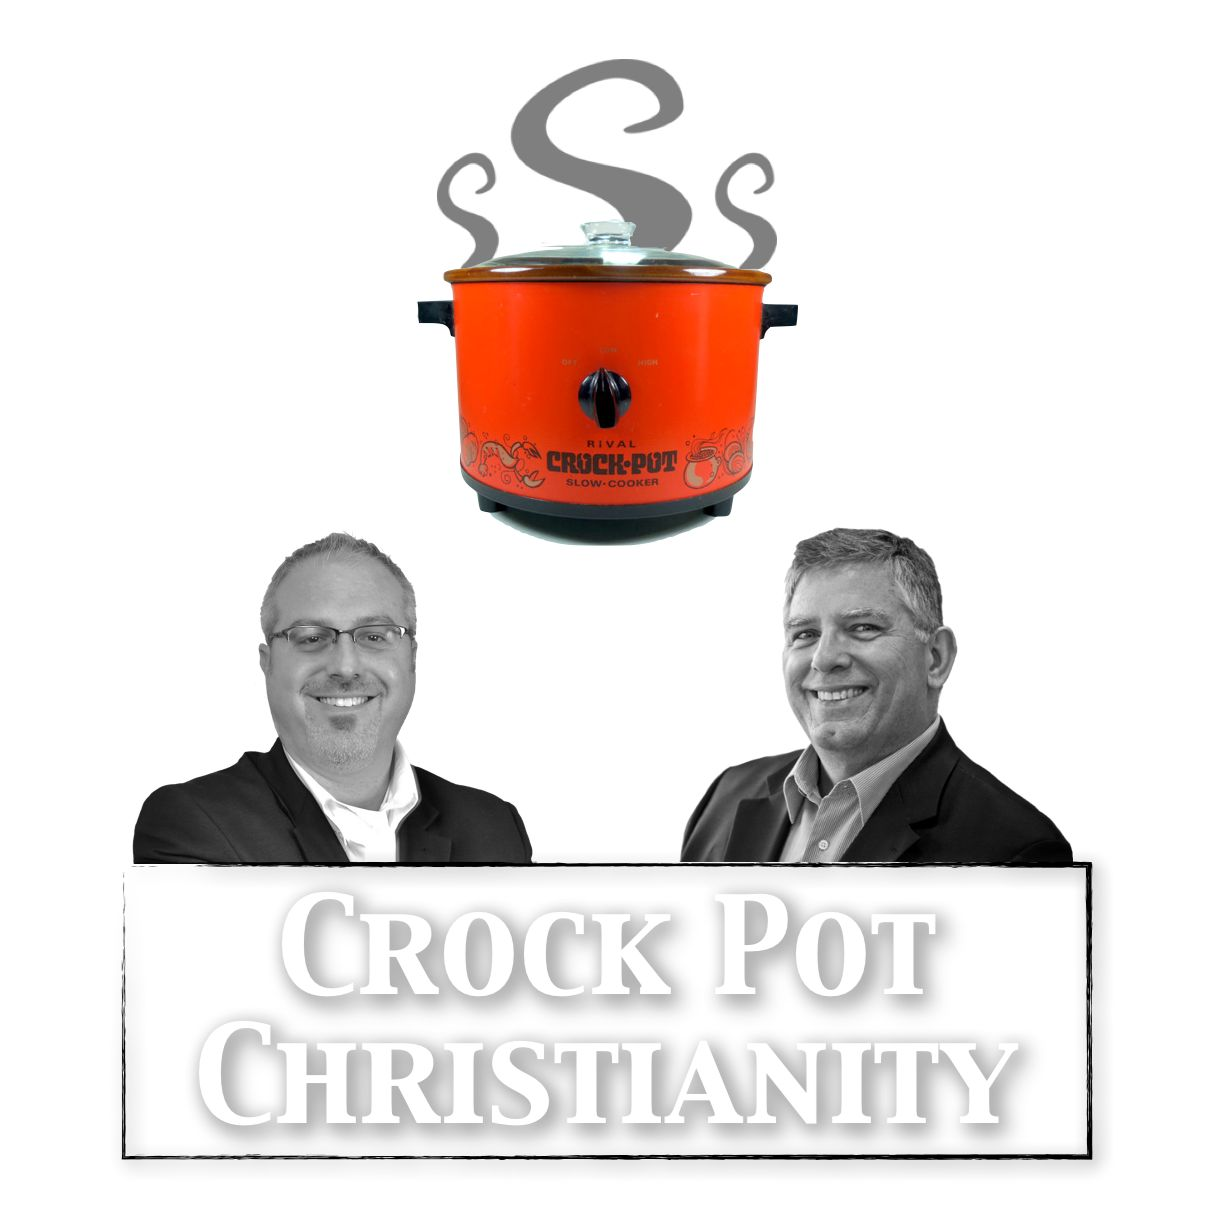 Crock Pot Christianity